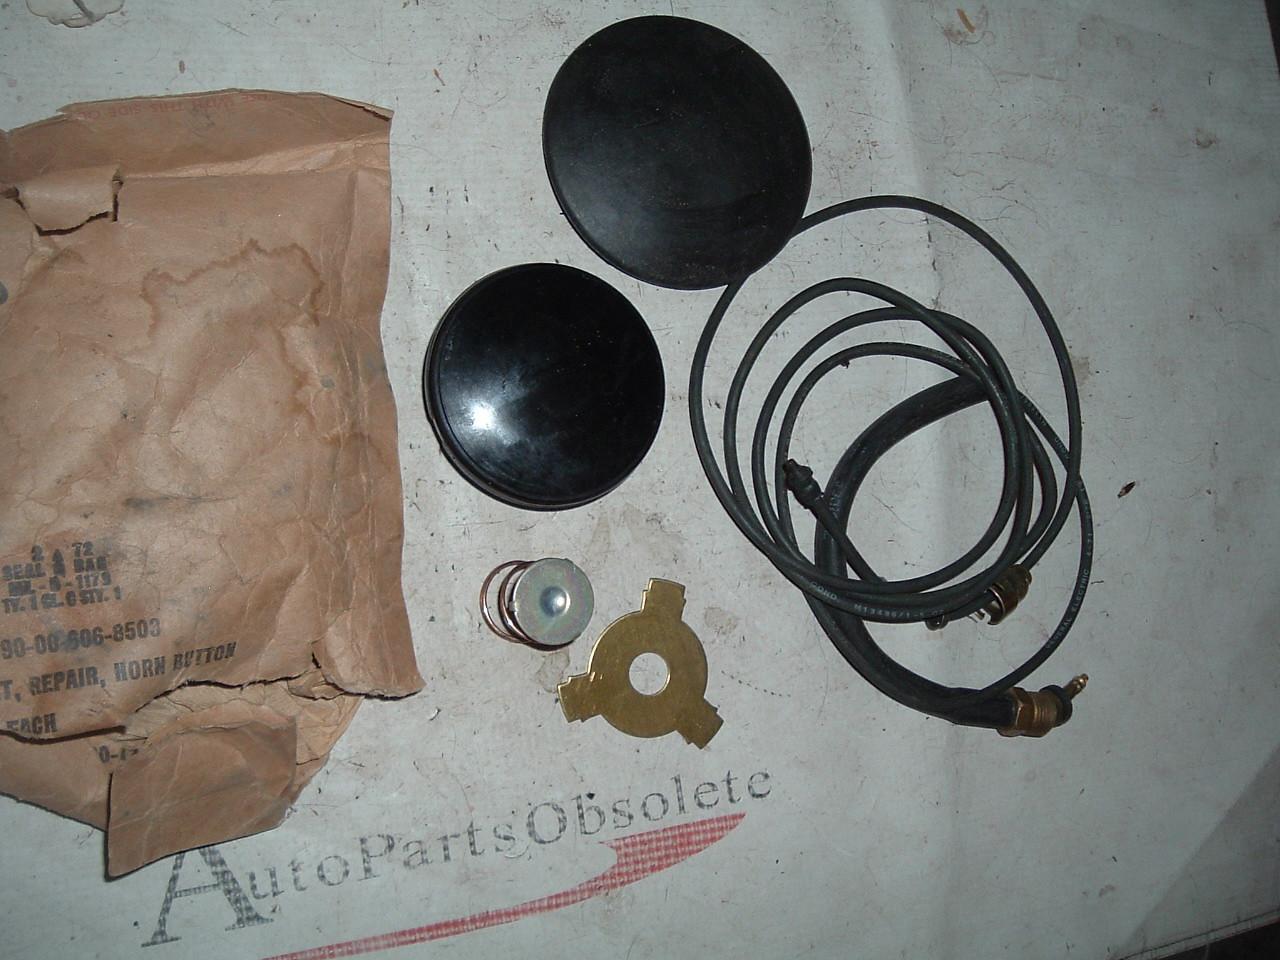 M-37 M-43 G-741 dodge truck military horn button repair kit new